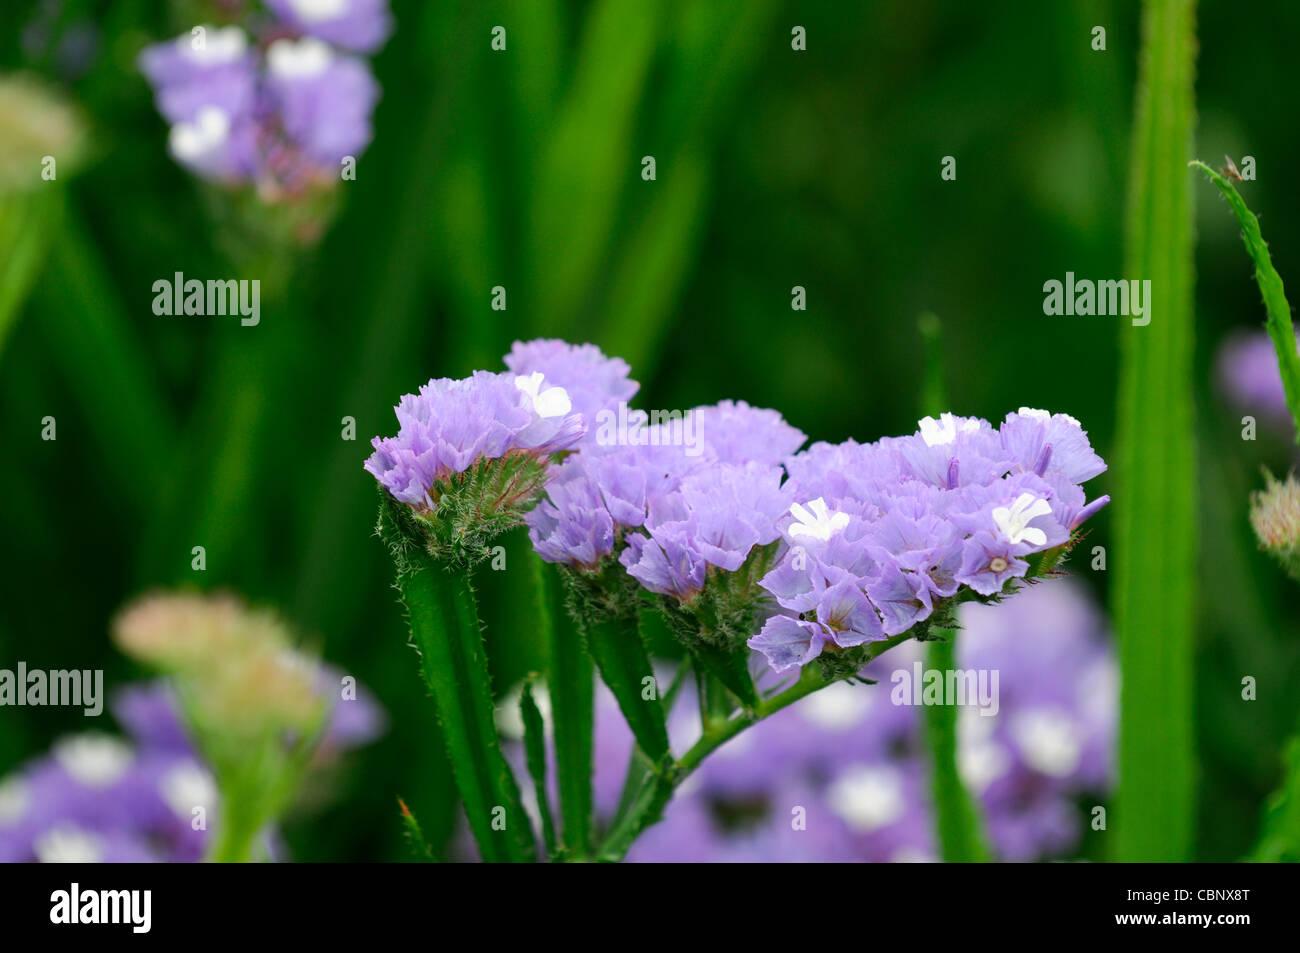 Statice sinuata Sunburst pale blue Limonium flowers bloom blossom annual Sea Lavender Statice Marsh-rosemary  distinctive - Stock Image